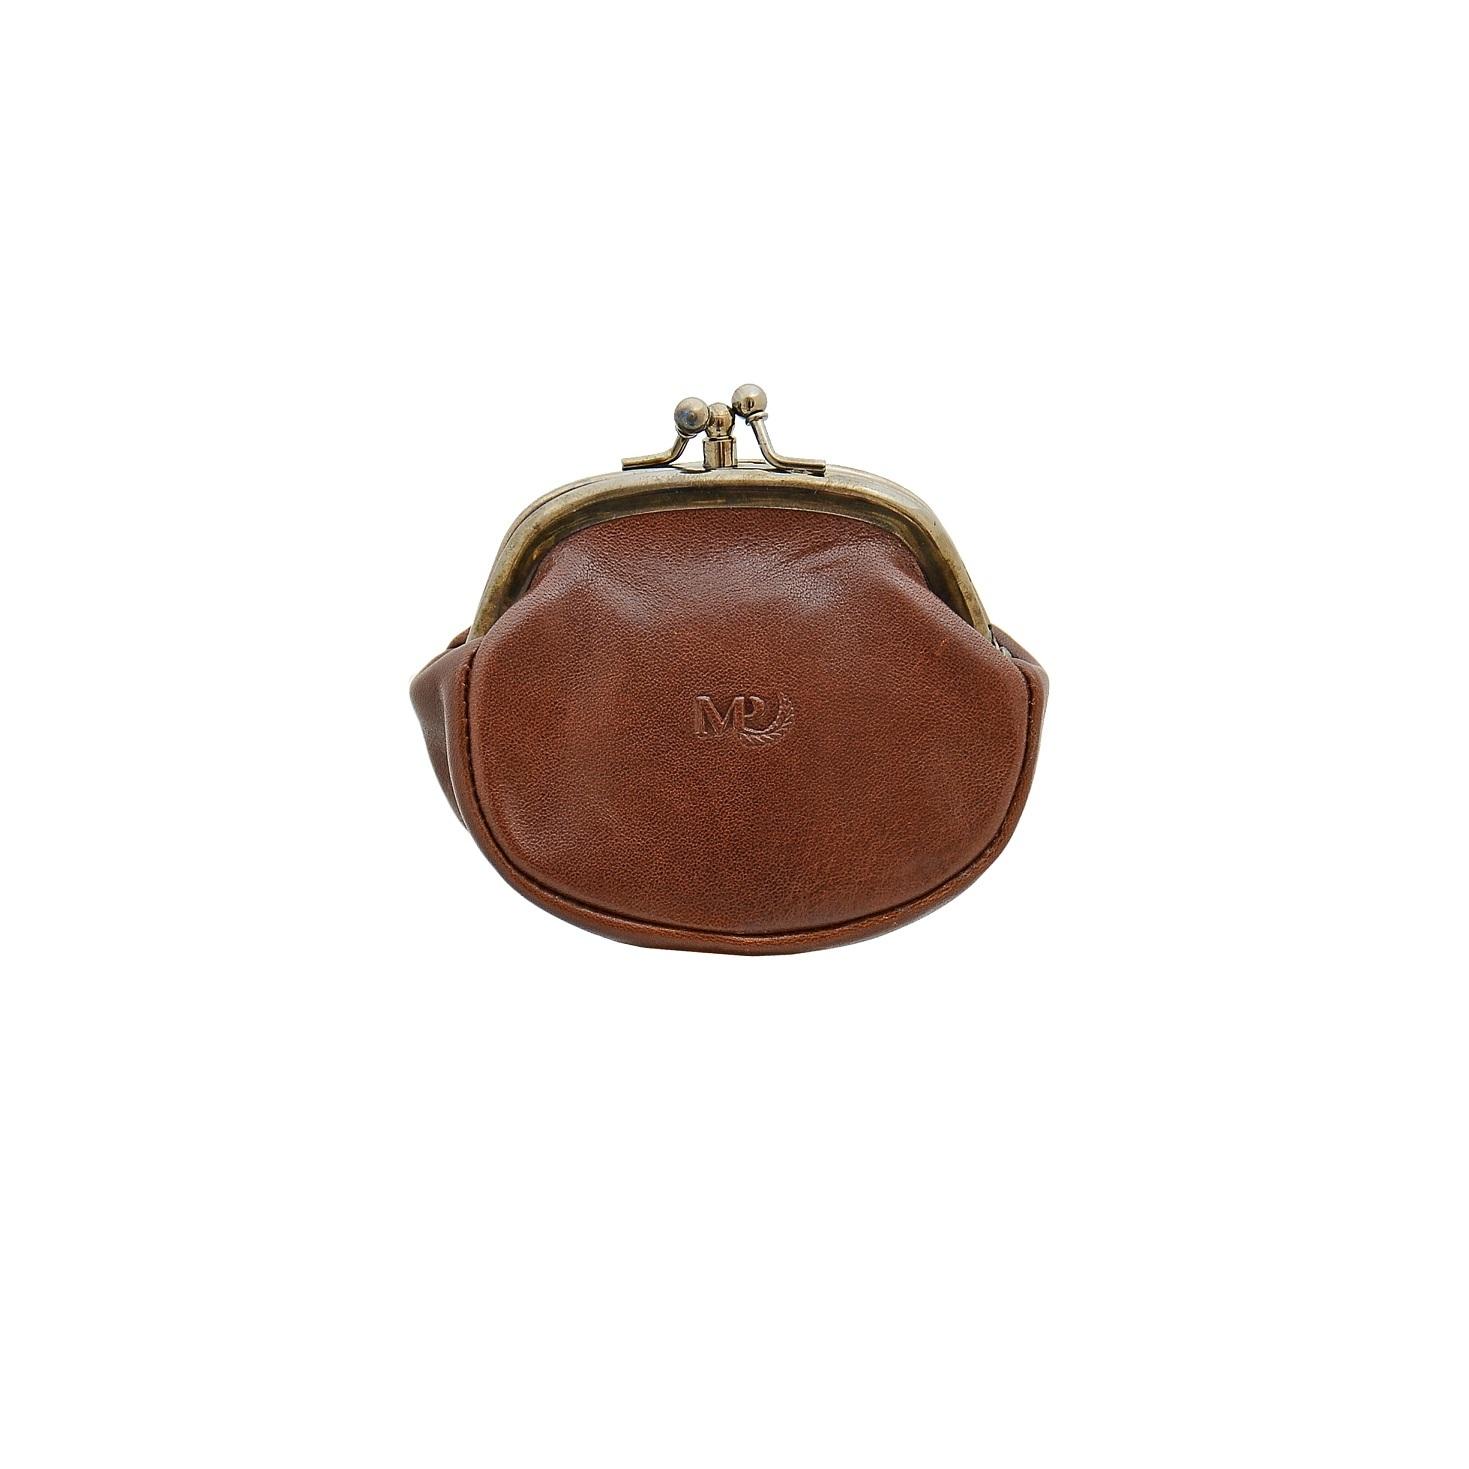 B120292 Cognac - Портмоне MP